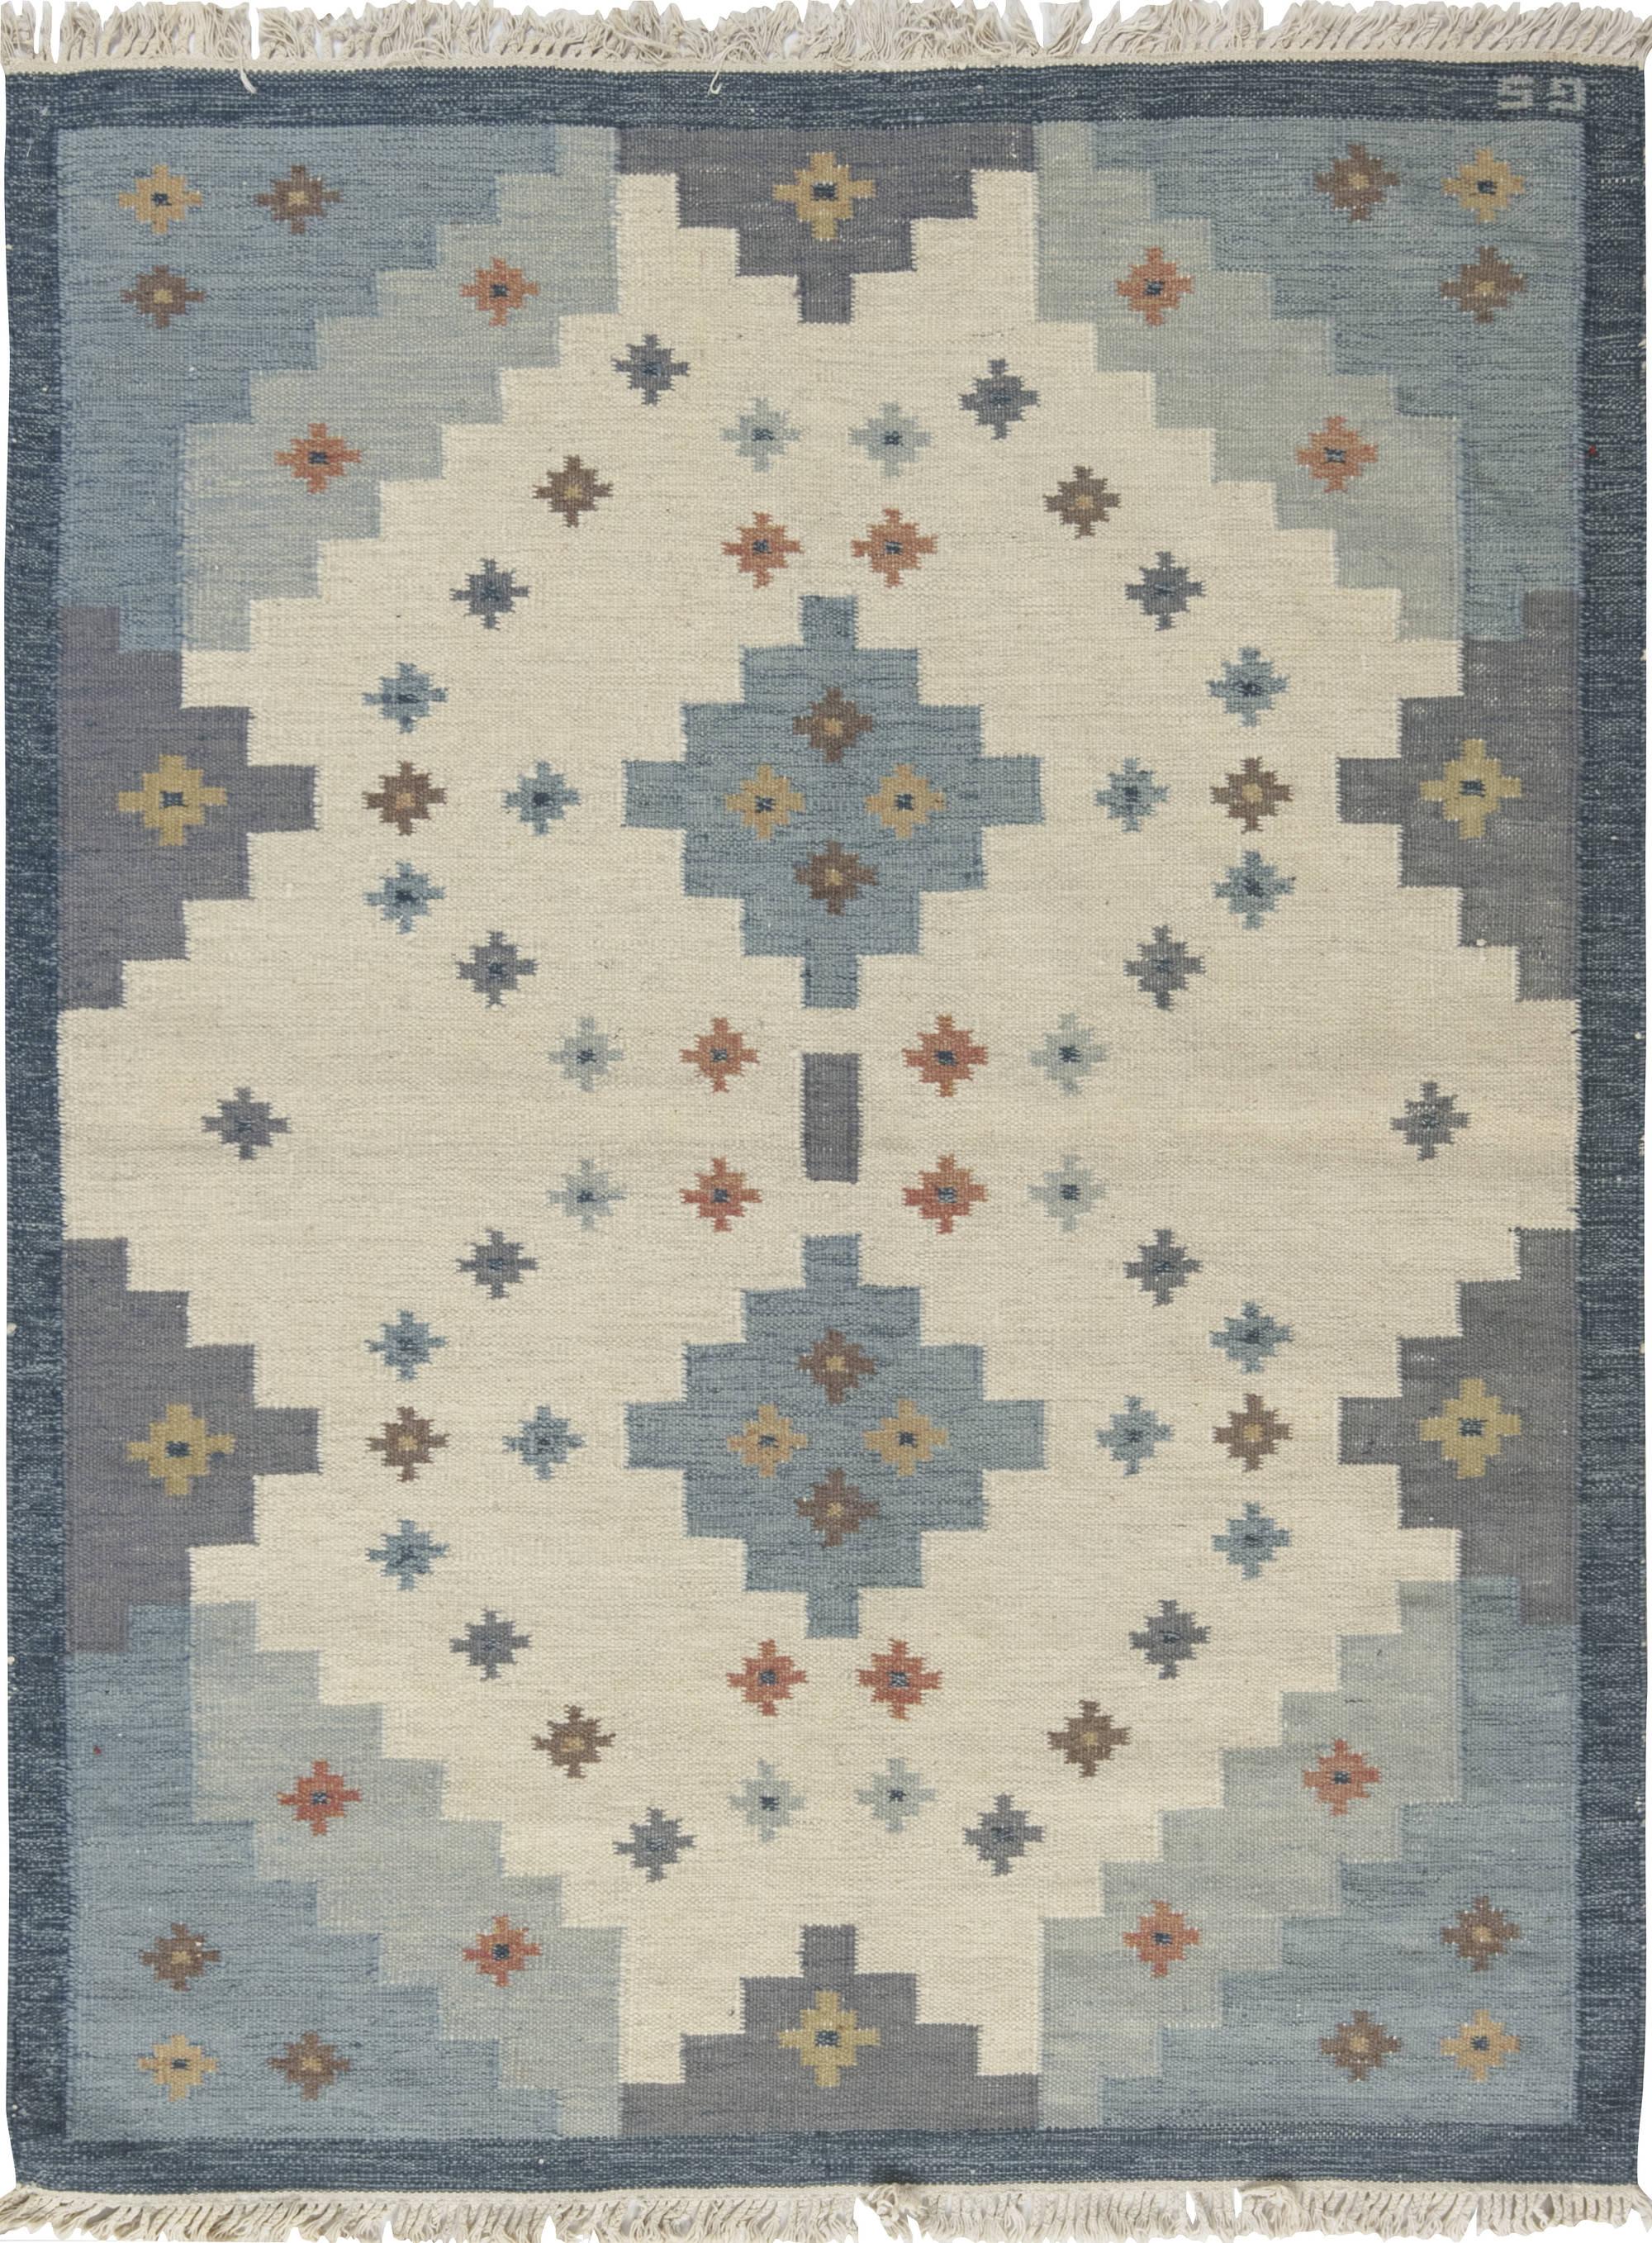 Vintage Swedish Flat-Weave Rug by Sverker Greuholm BB6554